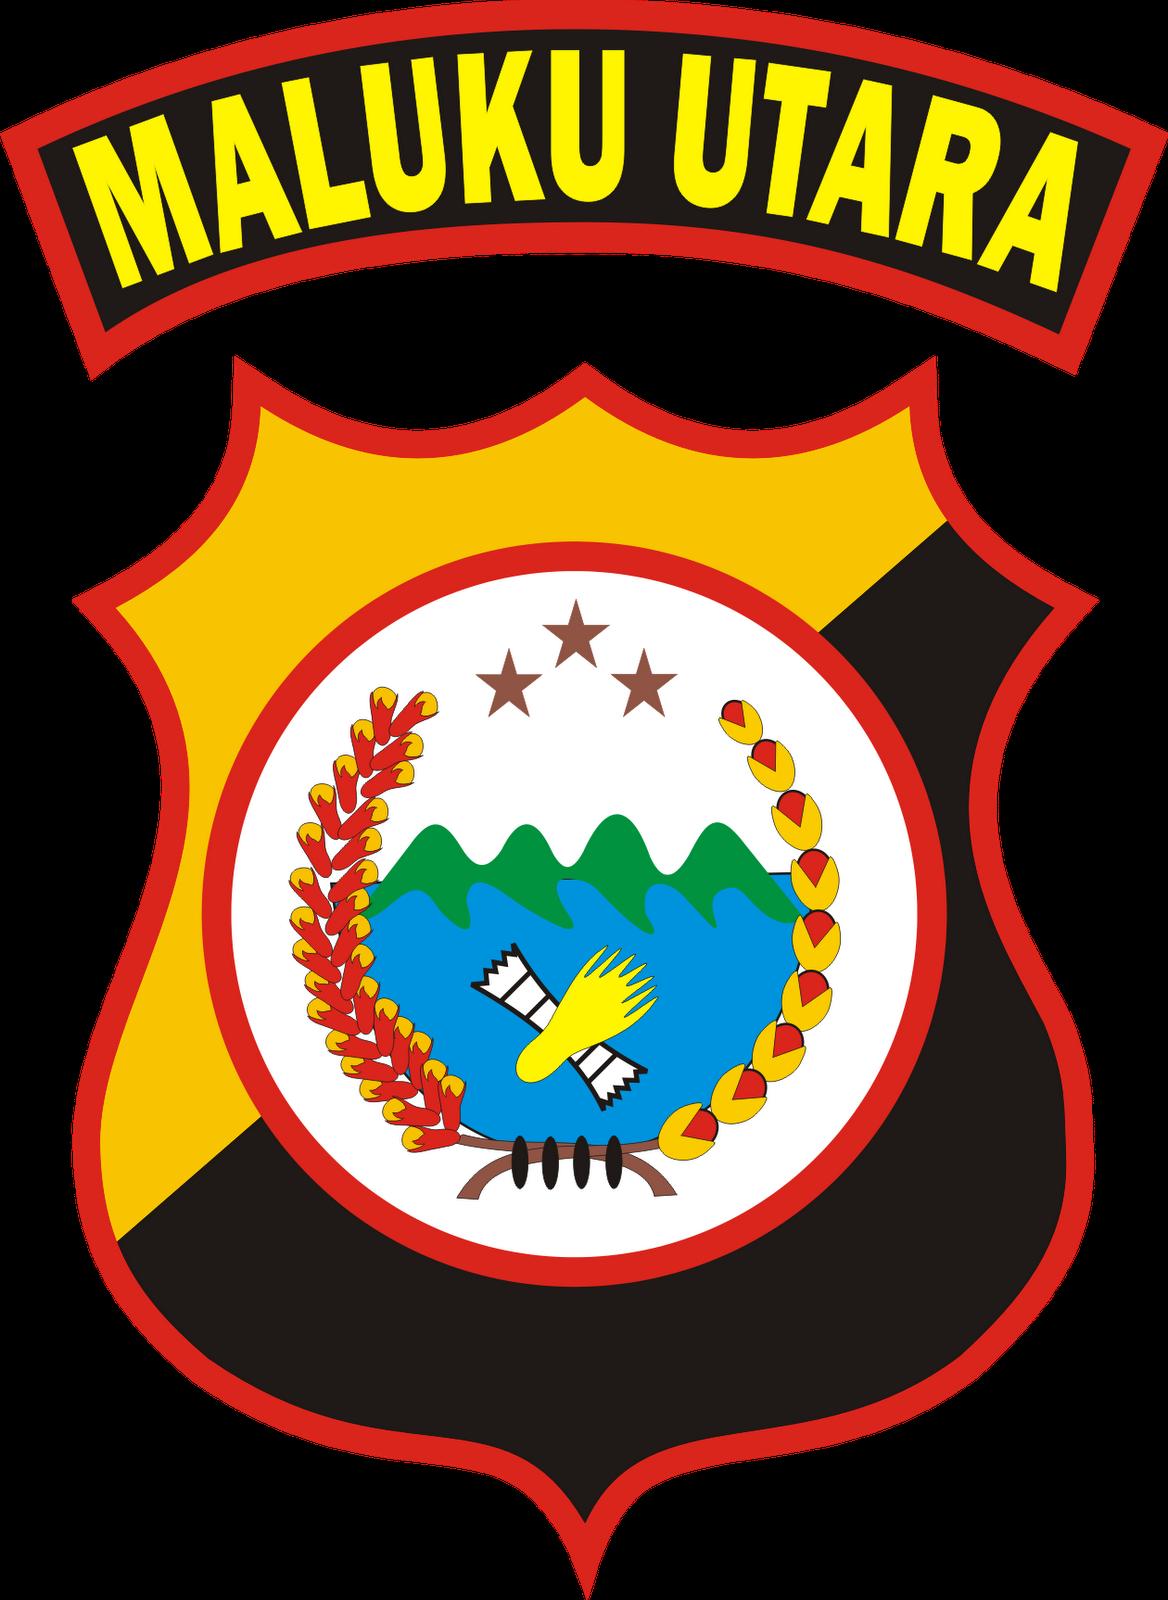 kepolisian daerah maluku utara wikipedia bahasa